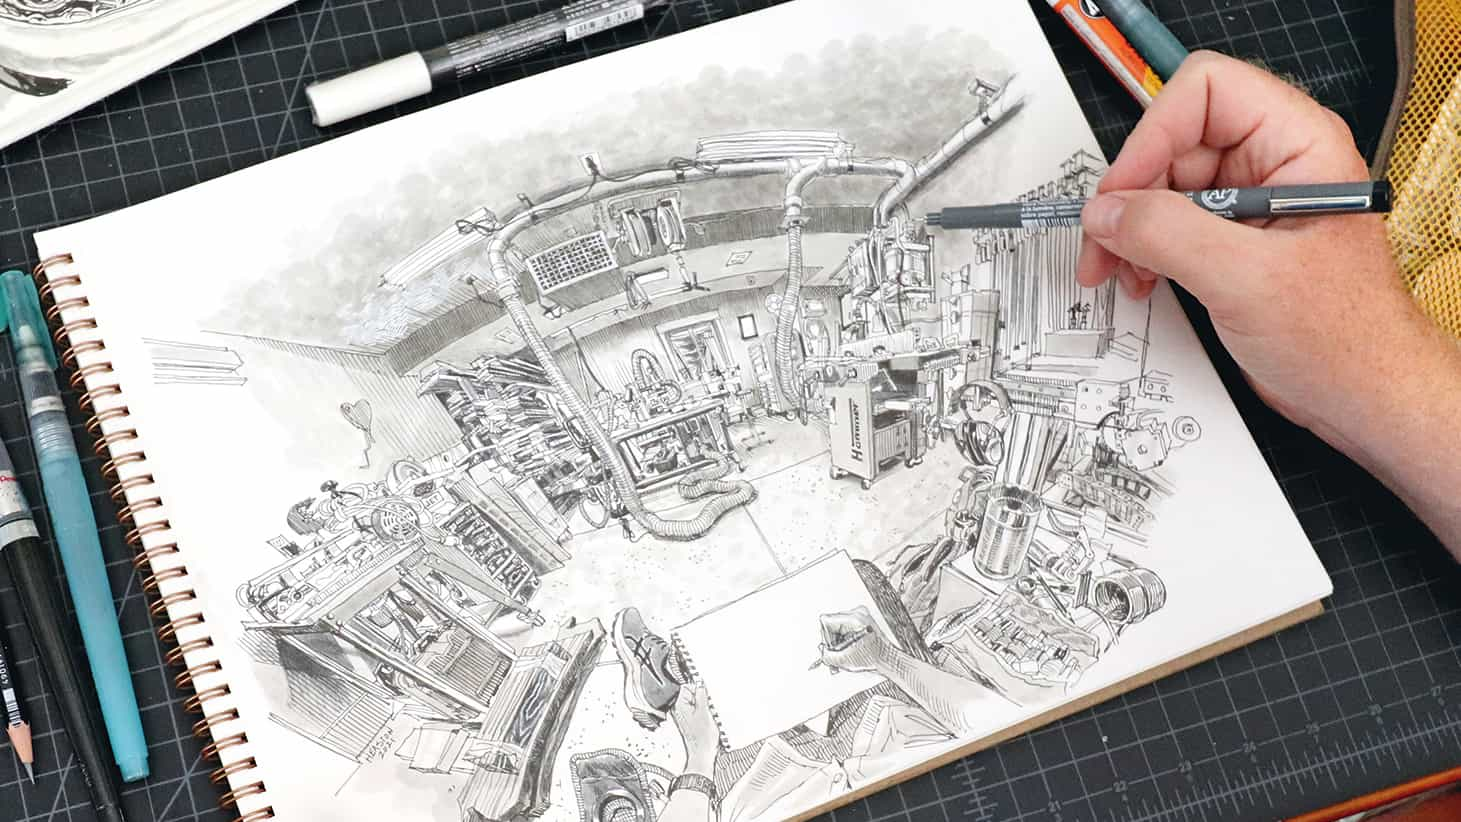 Cómo dibujar una perspectiva de gran angular